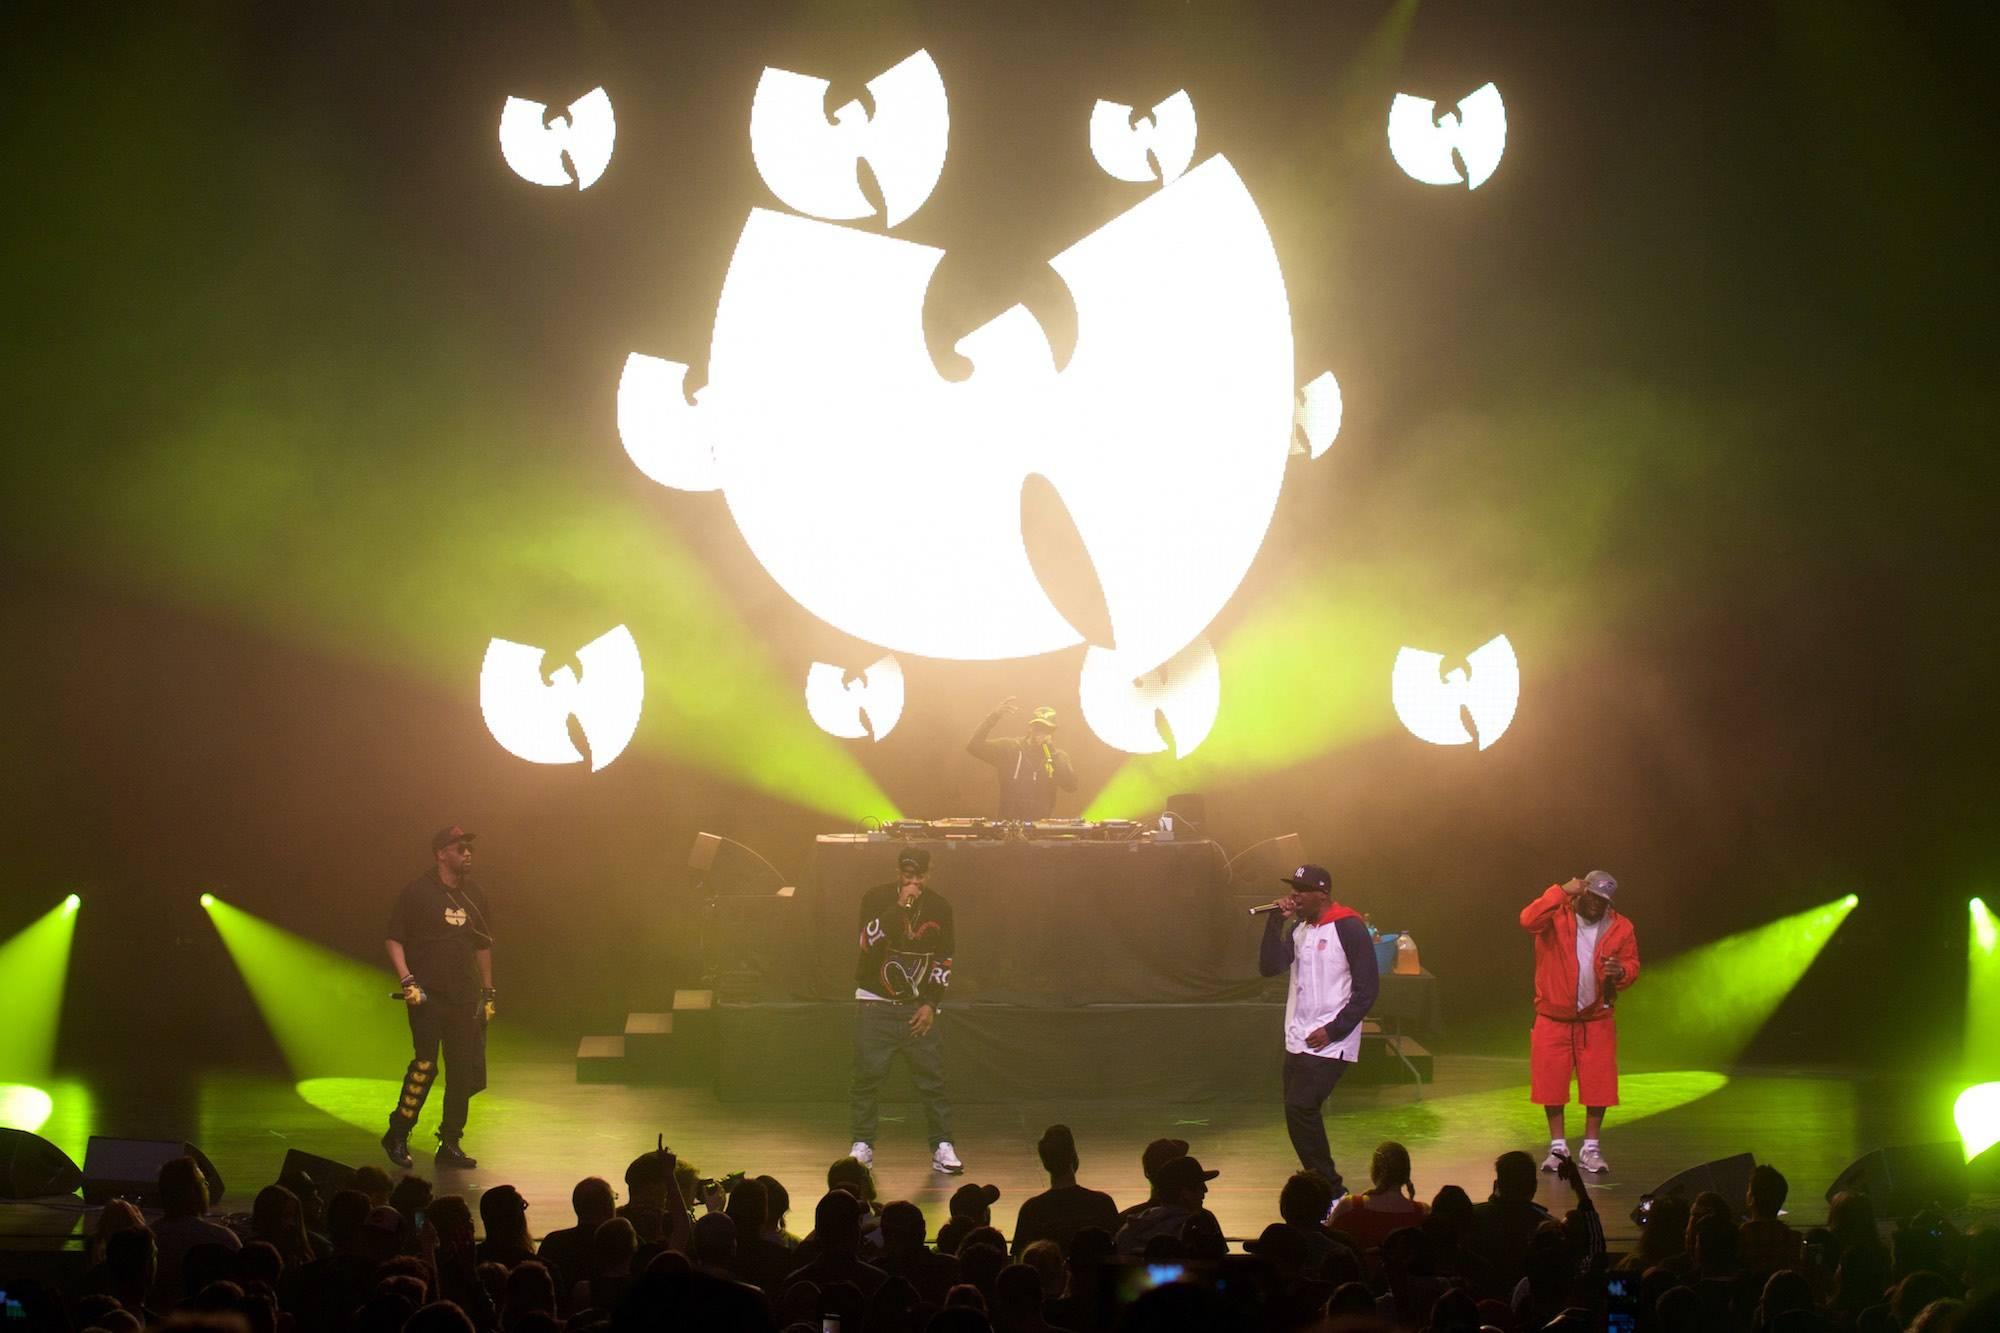 TD Vancouver International Jazz Fest Presents: Wu Tang Clan at the Queen Elizabeth Theatre, Vancouver, Jun 23 2019. Scott Alexander photo.